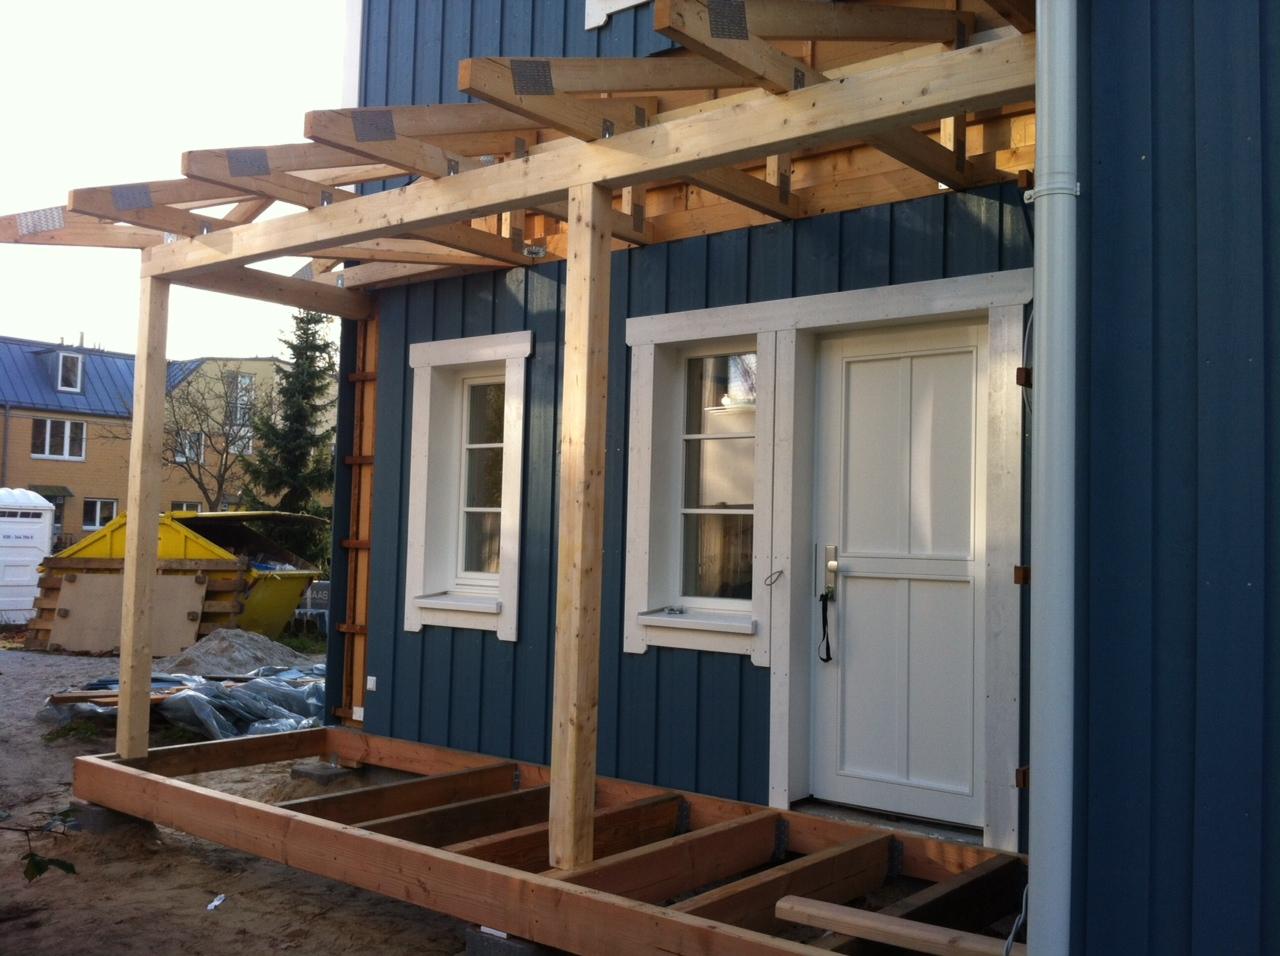 awesome haus mit veranda bauen photos. Black Bedroom Furniture Sets. Home Design Ideas